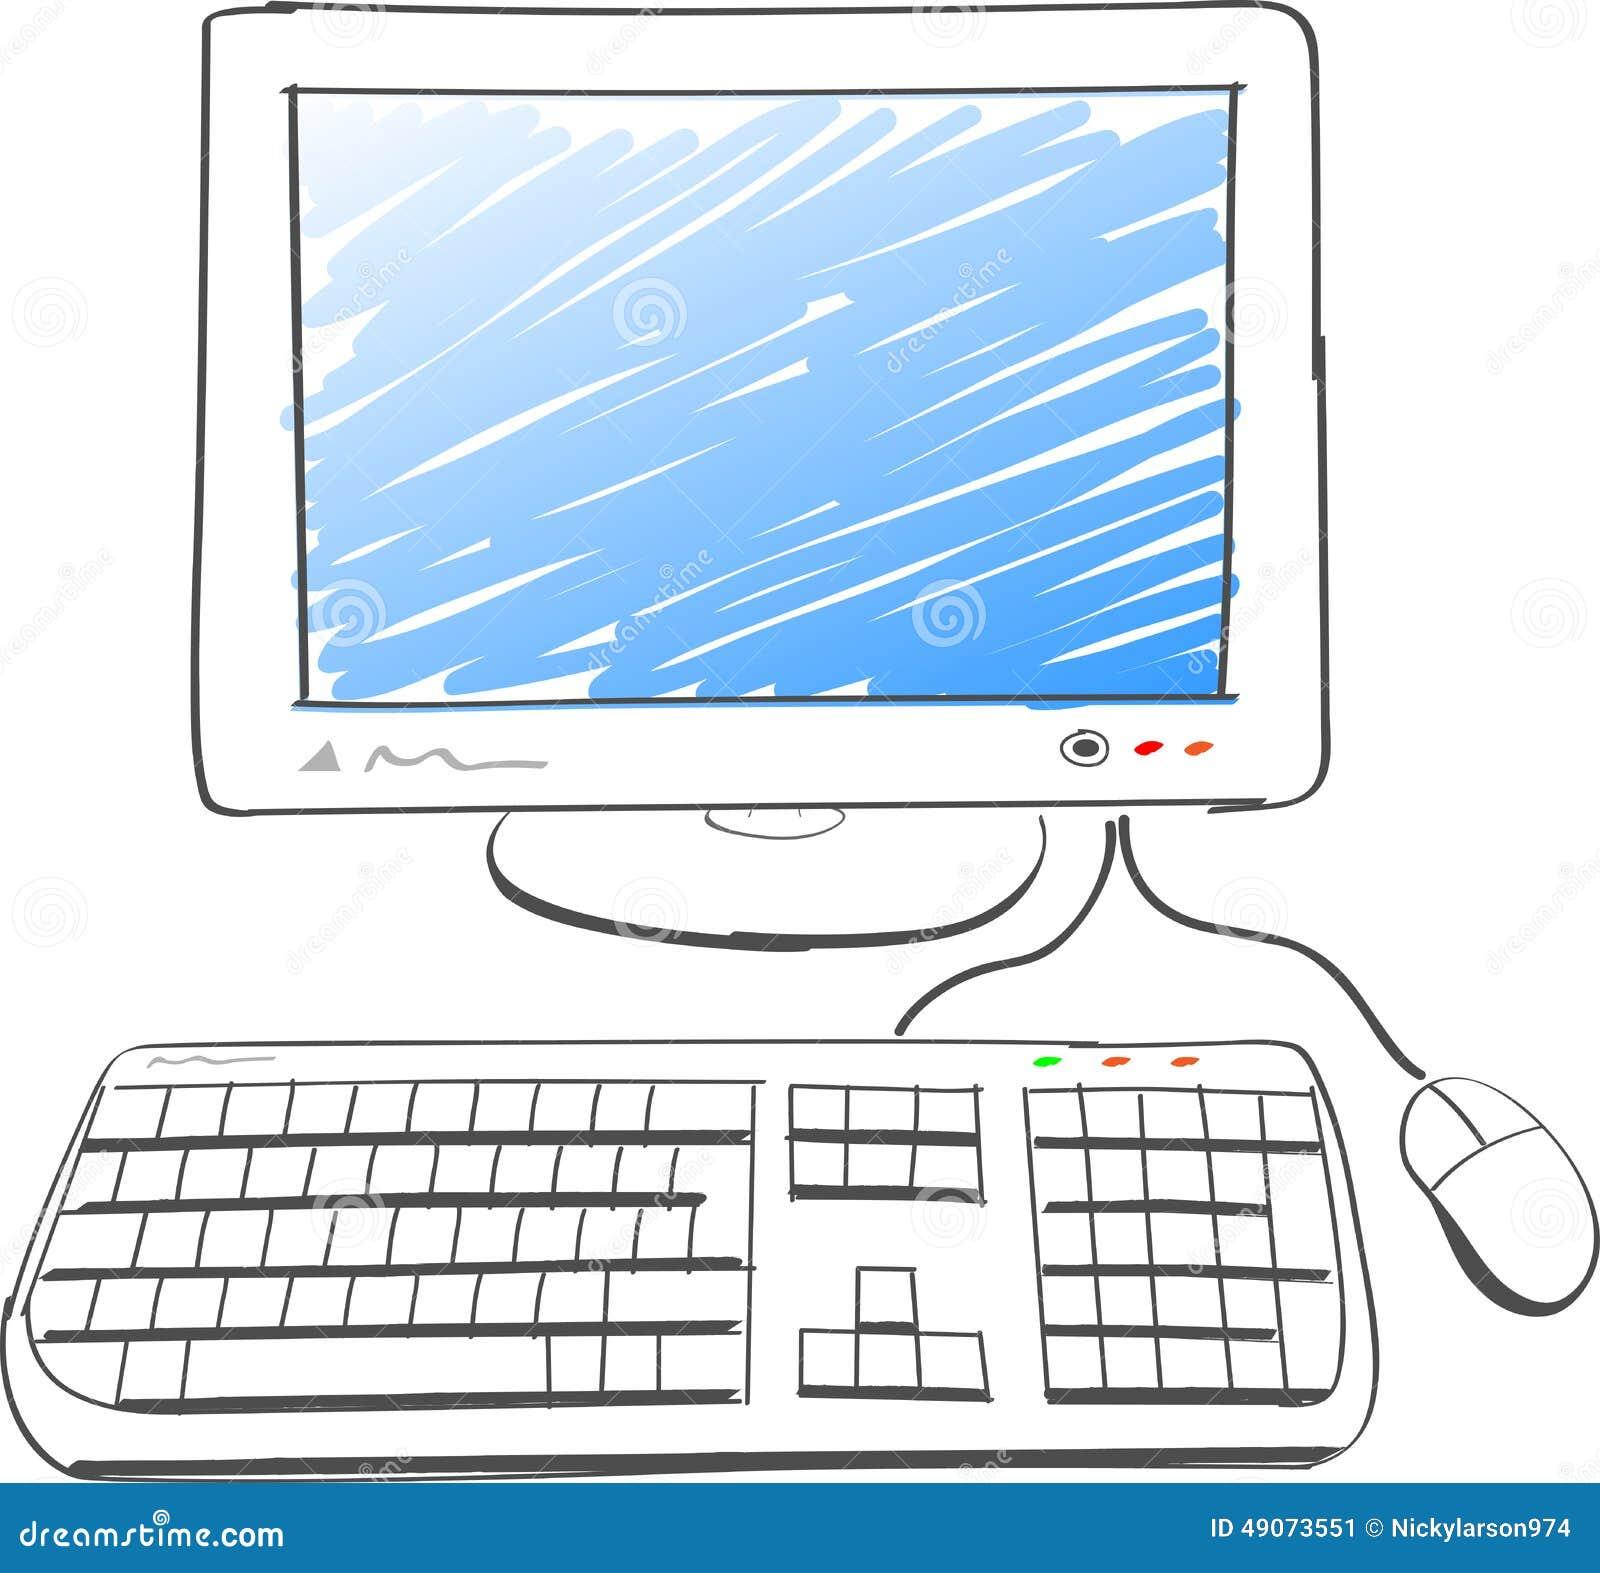 Keyboard Kid - Based In The Rain III